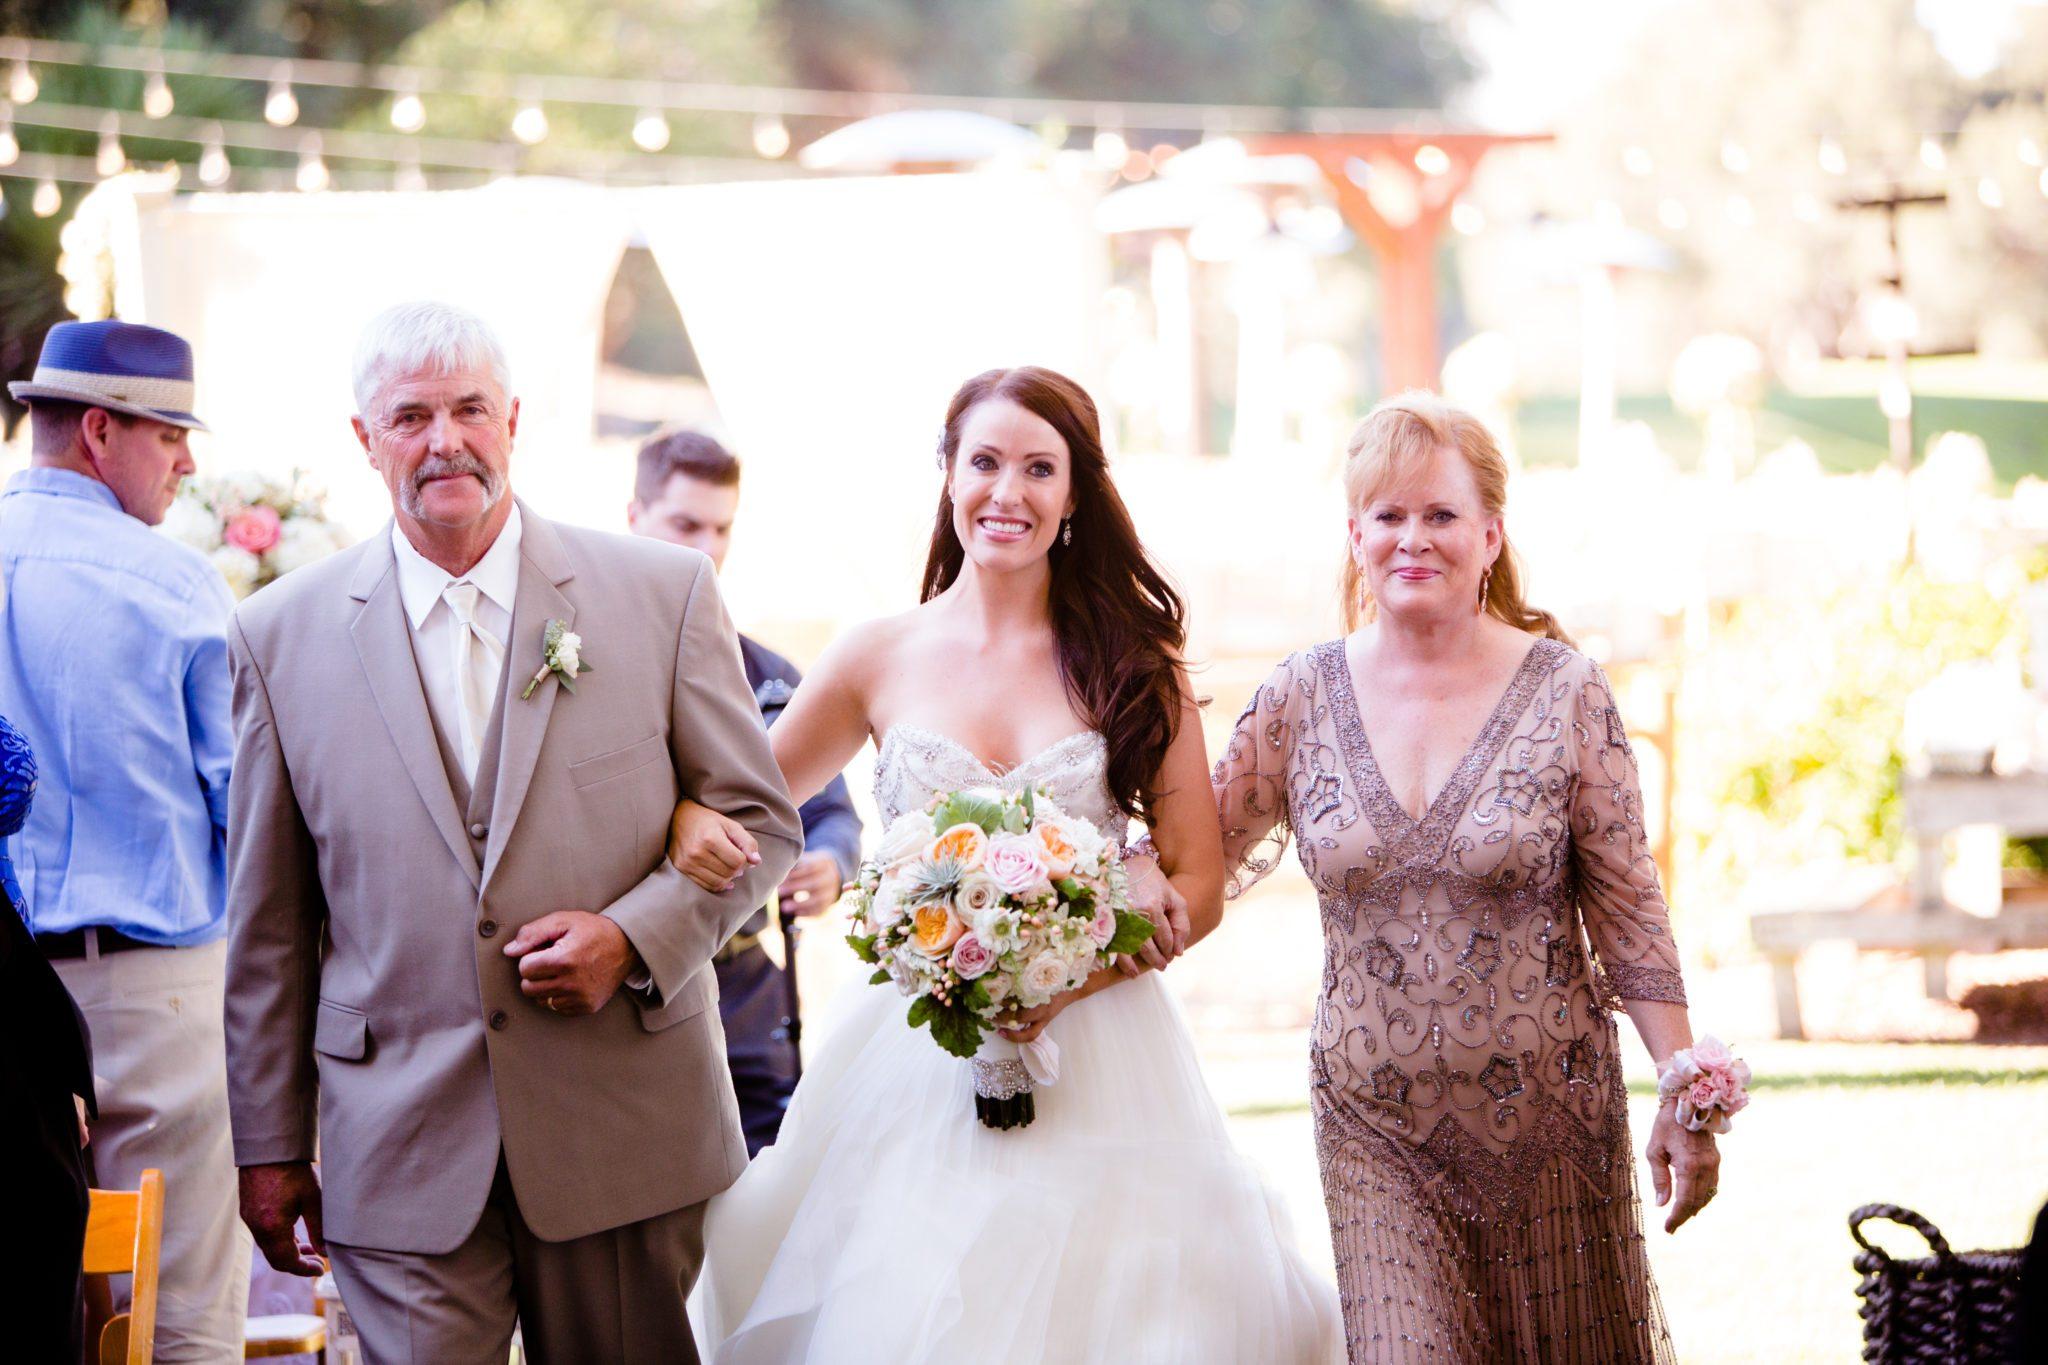 Temecula_Creek_Inn_Wedding_077.jpg